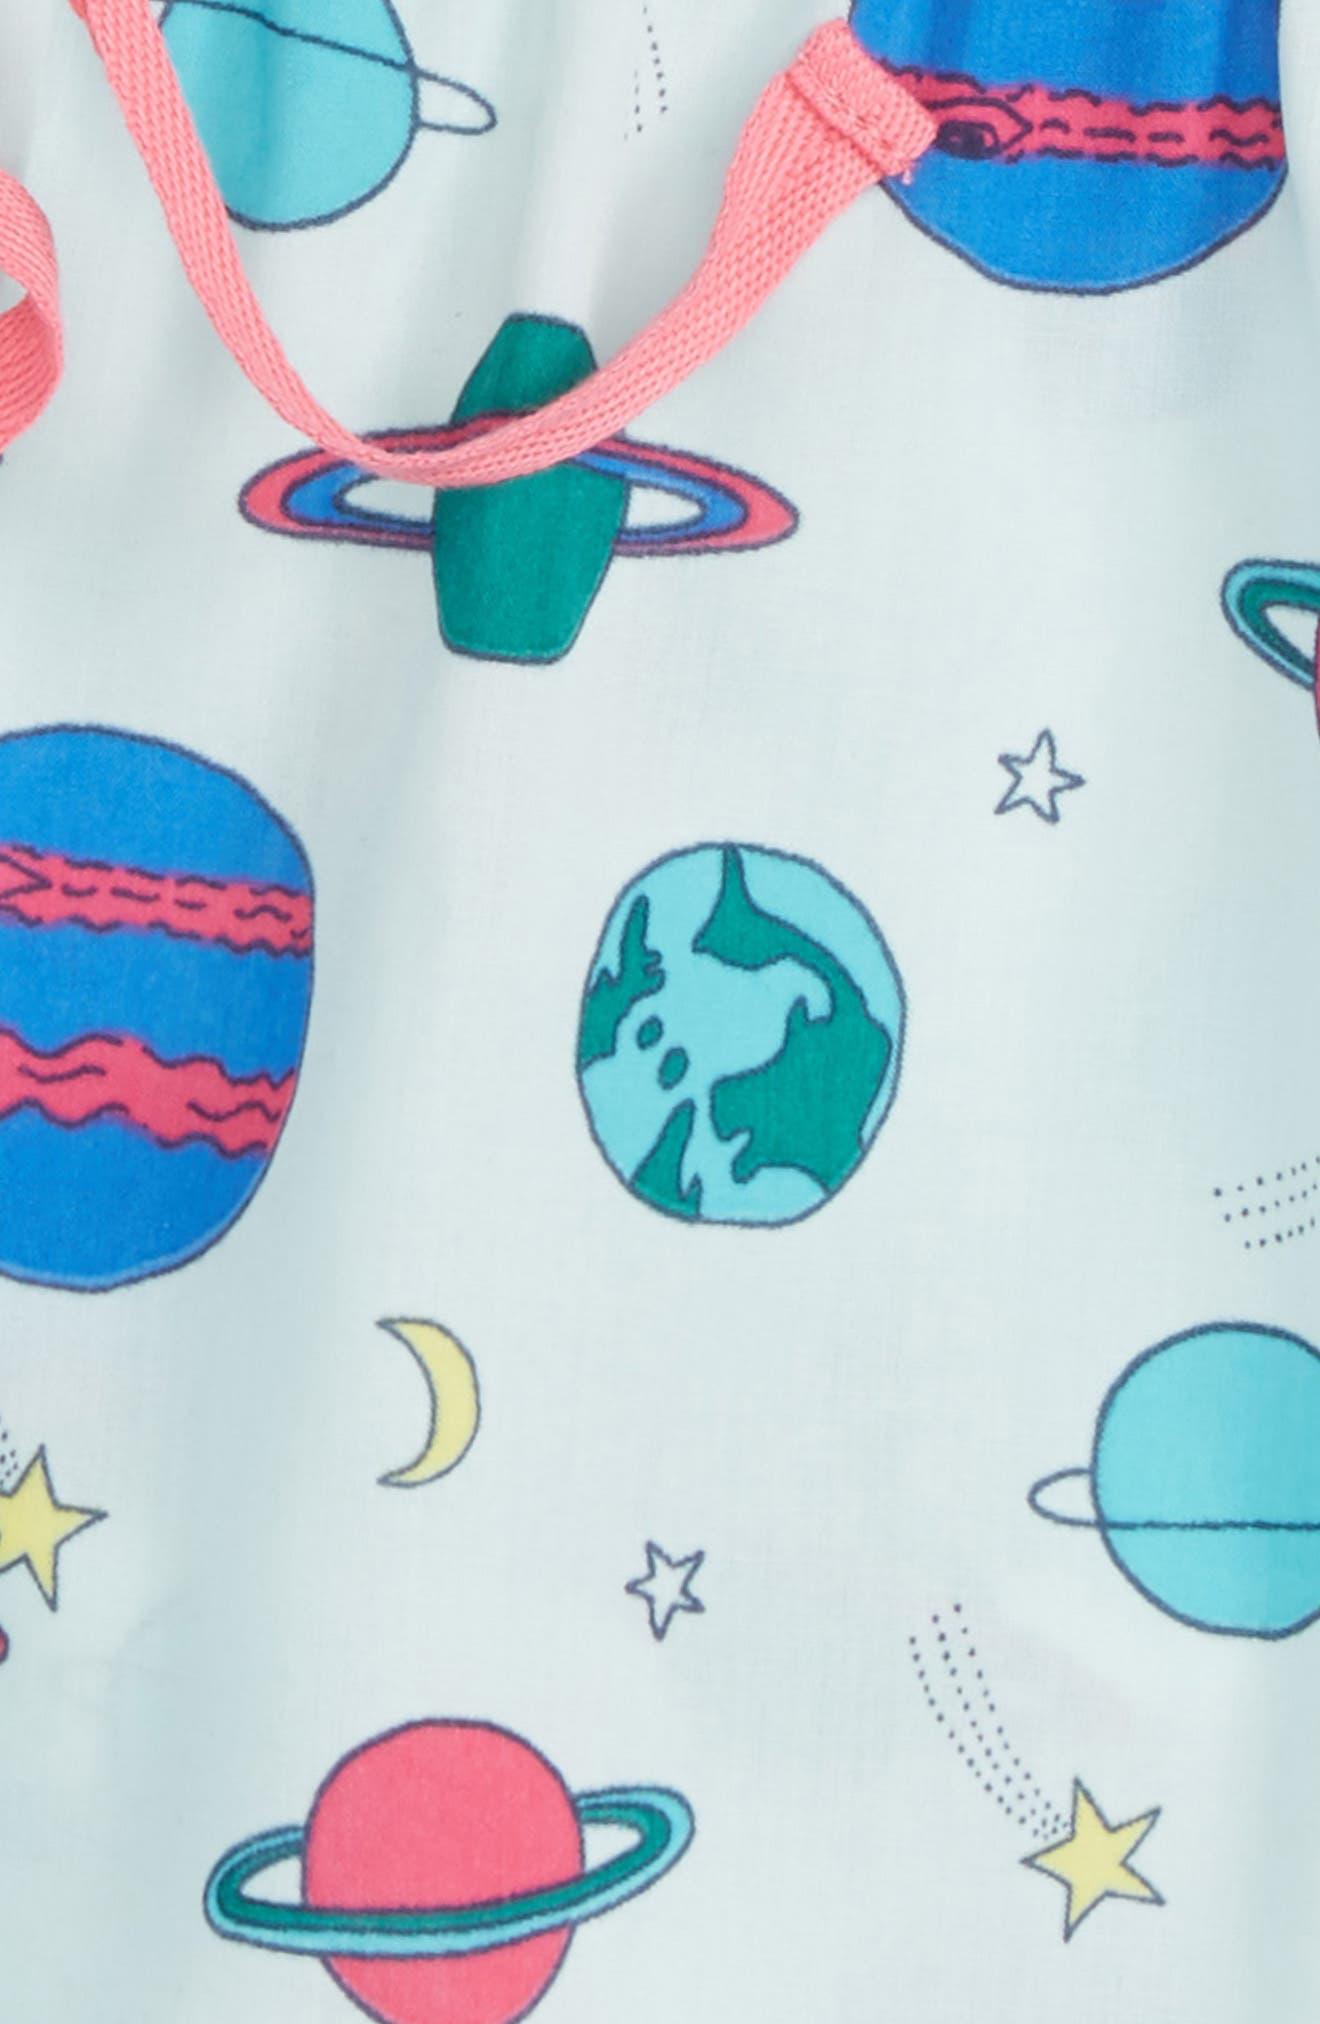 Ruffle Pajama Shorts,                             Alternate thumbnail 2, color,                             Teal Fair Space